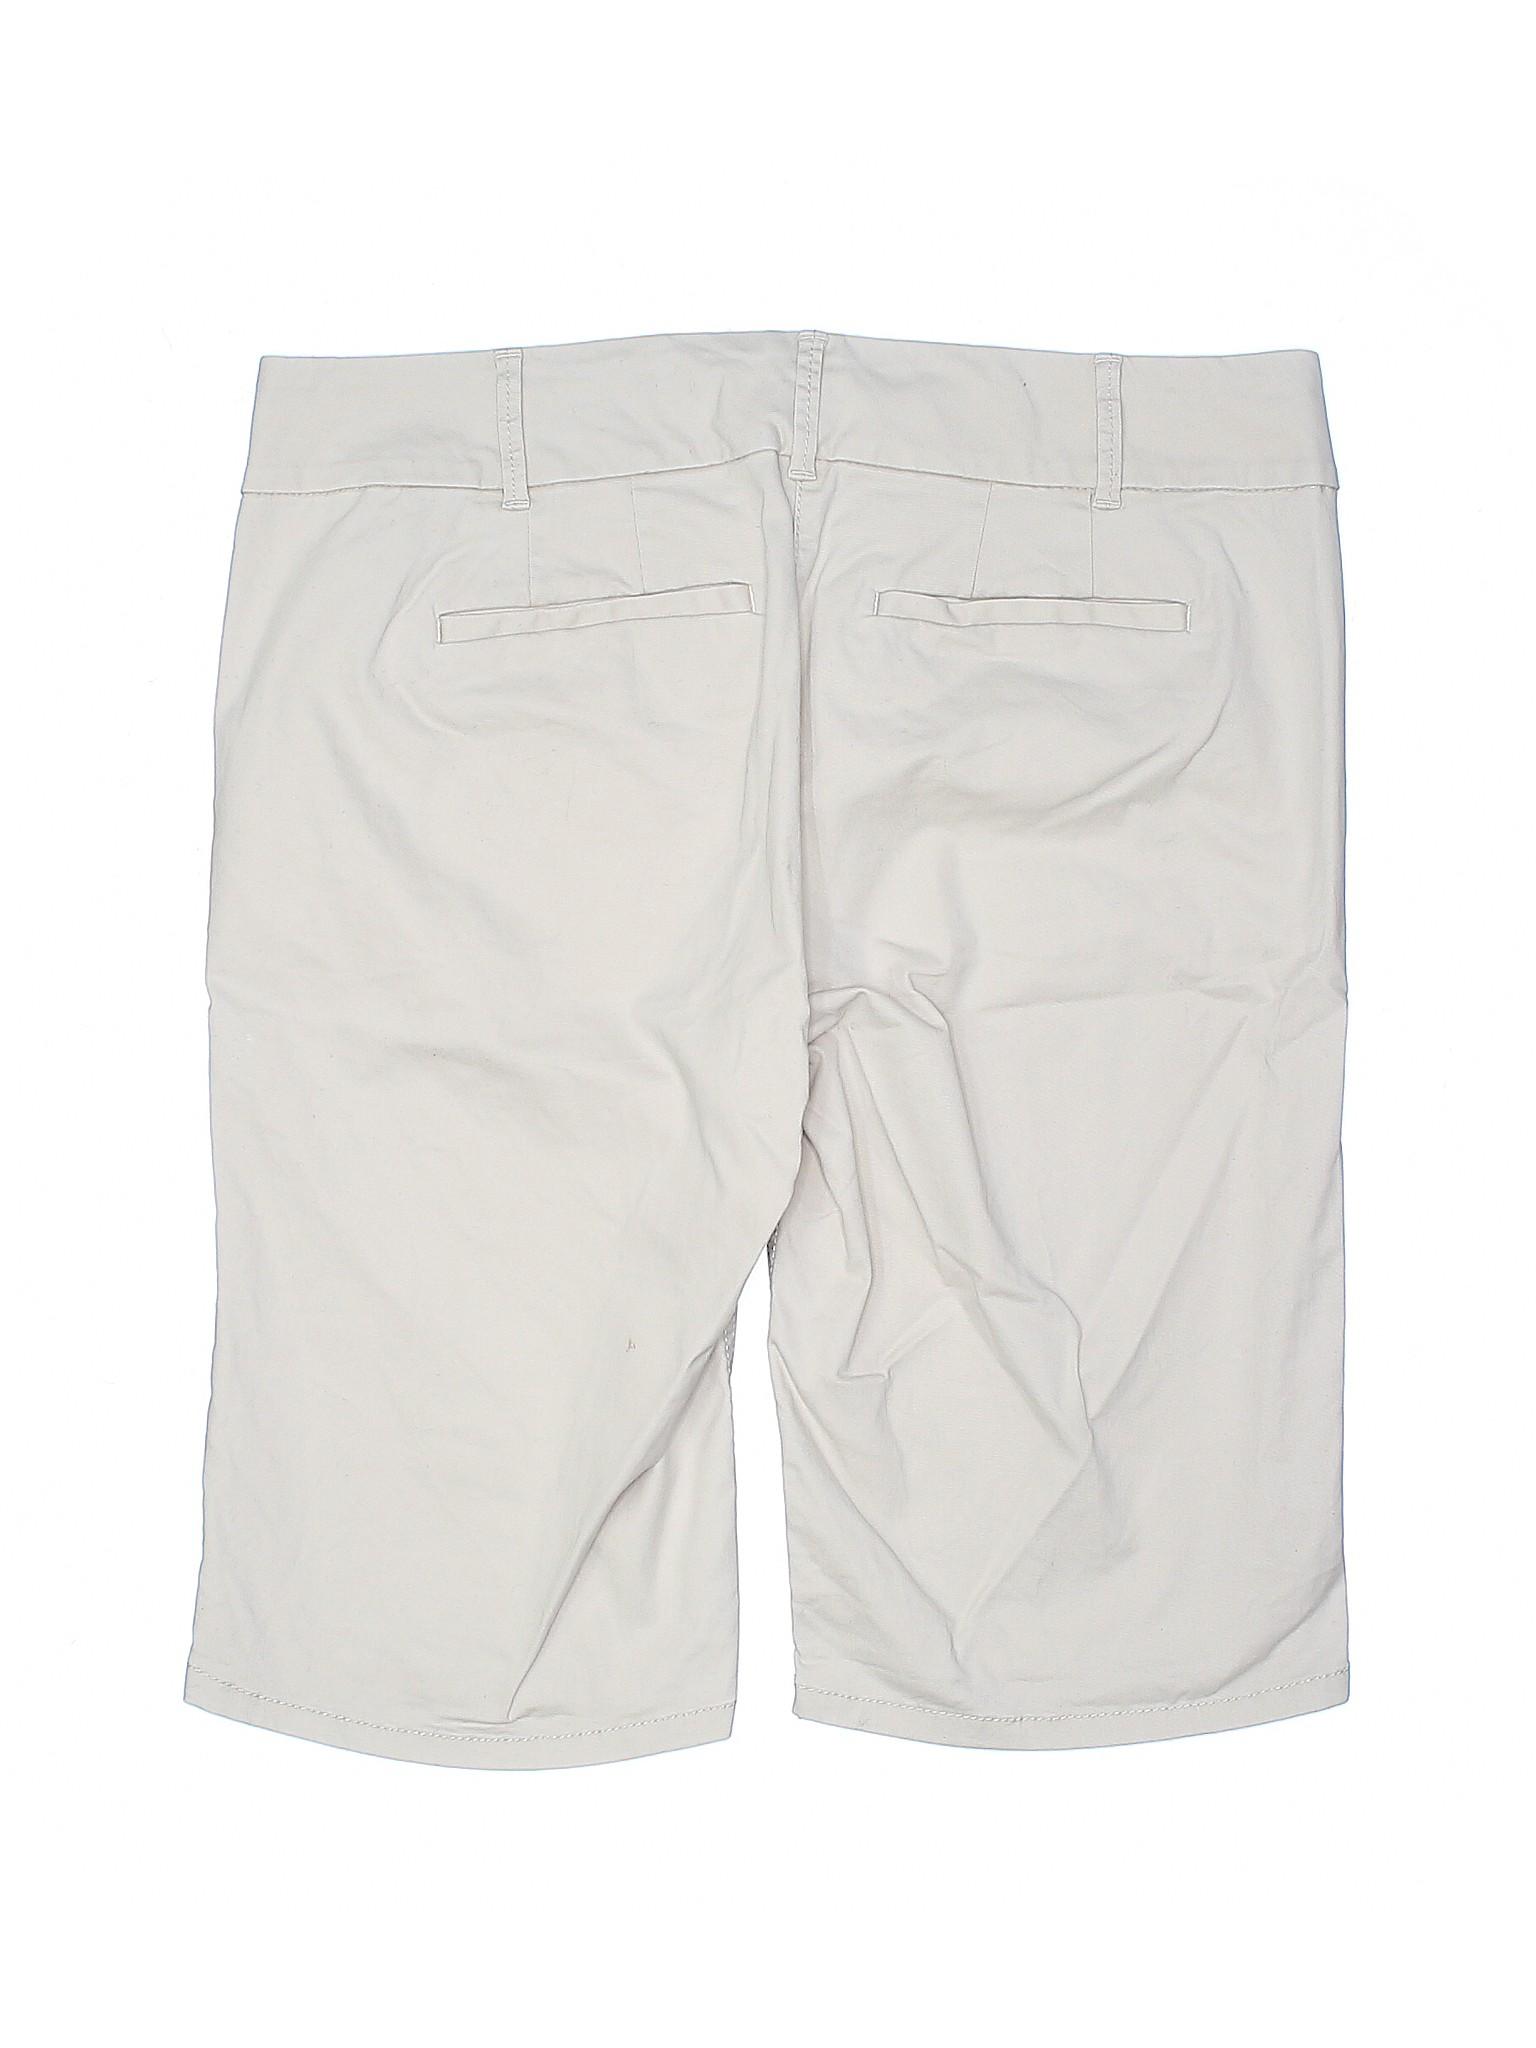 Khaki Ann Boutique Shorts Taylor LOFT vwYgTwxqU8